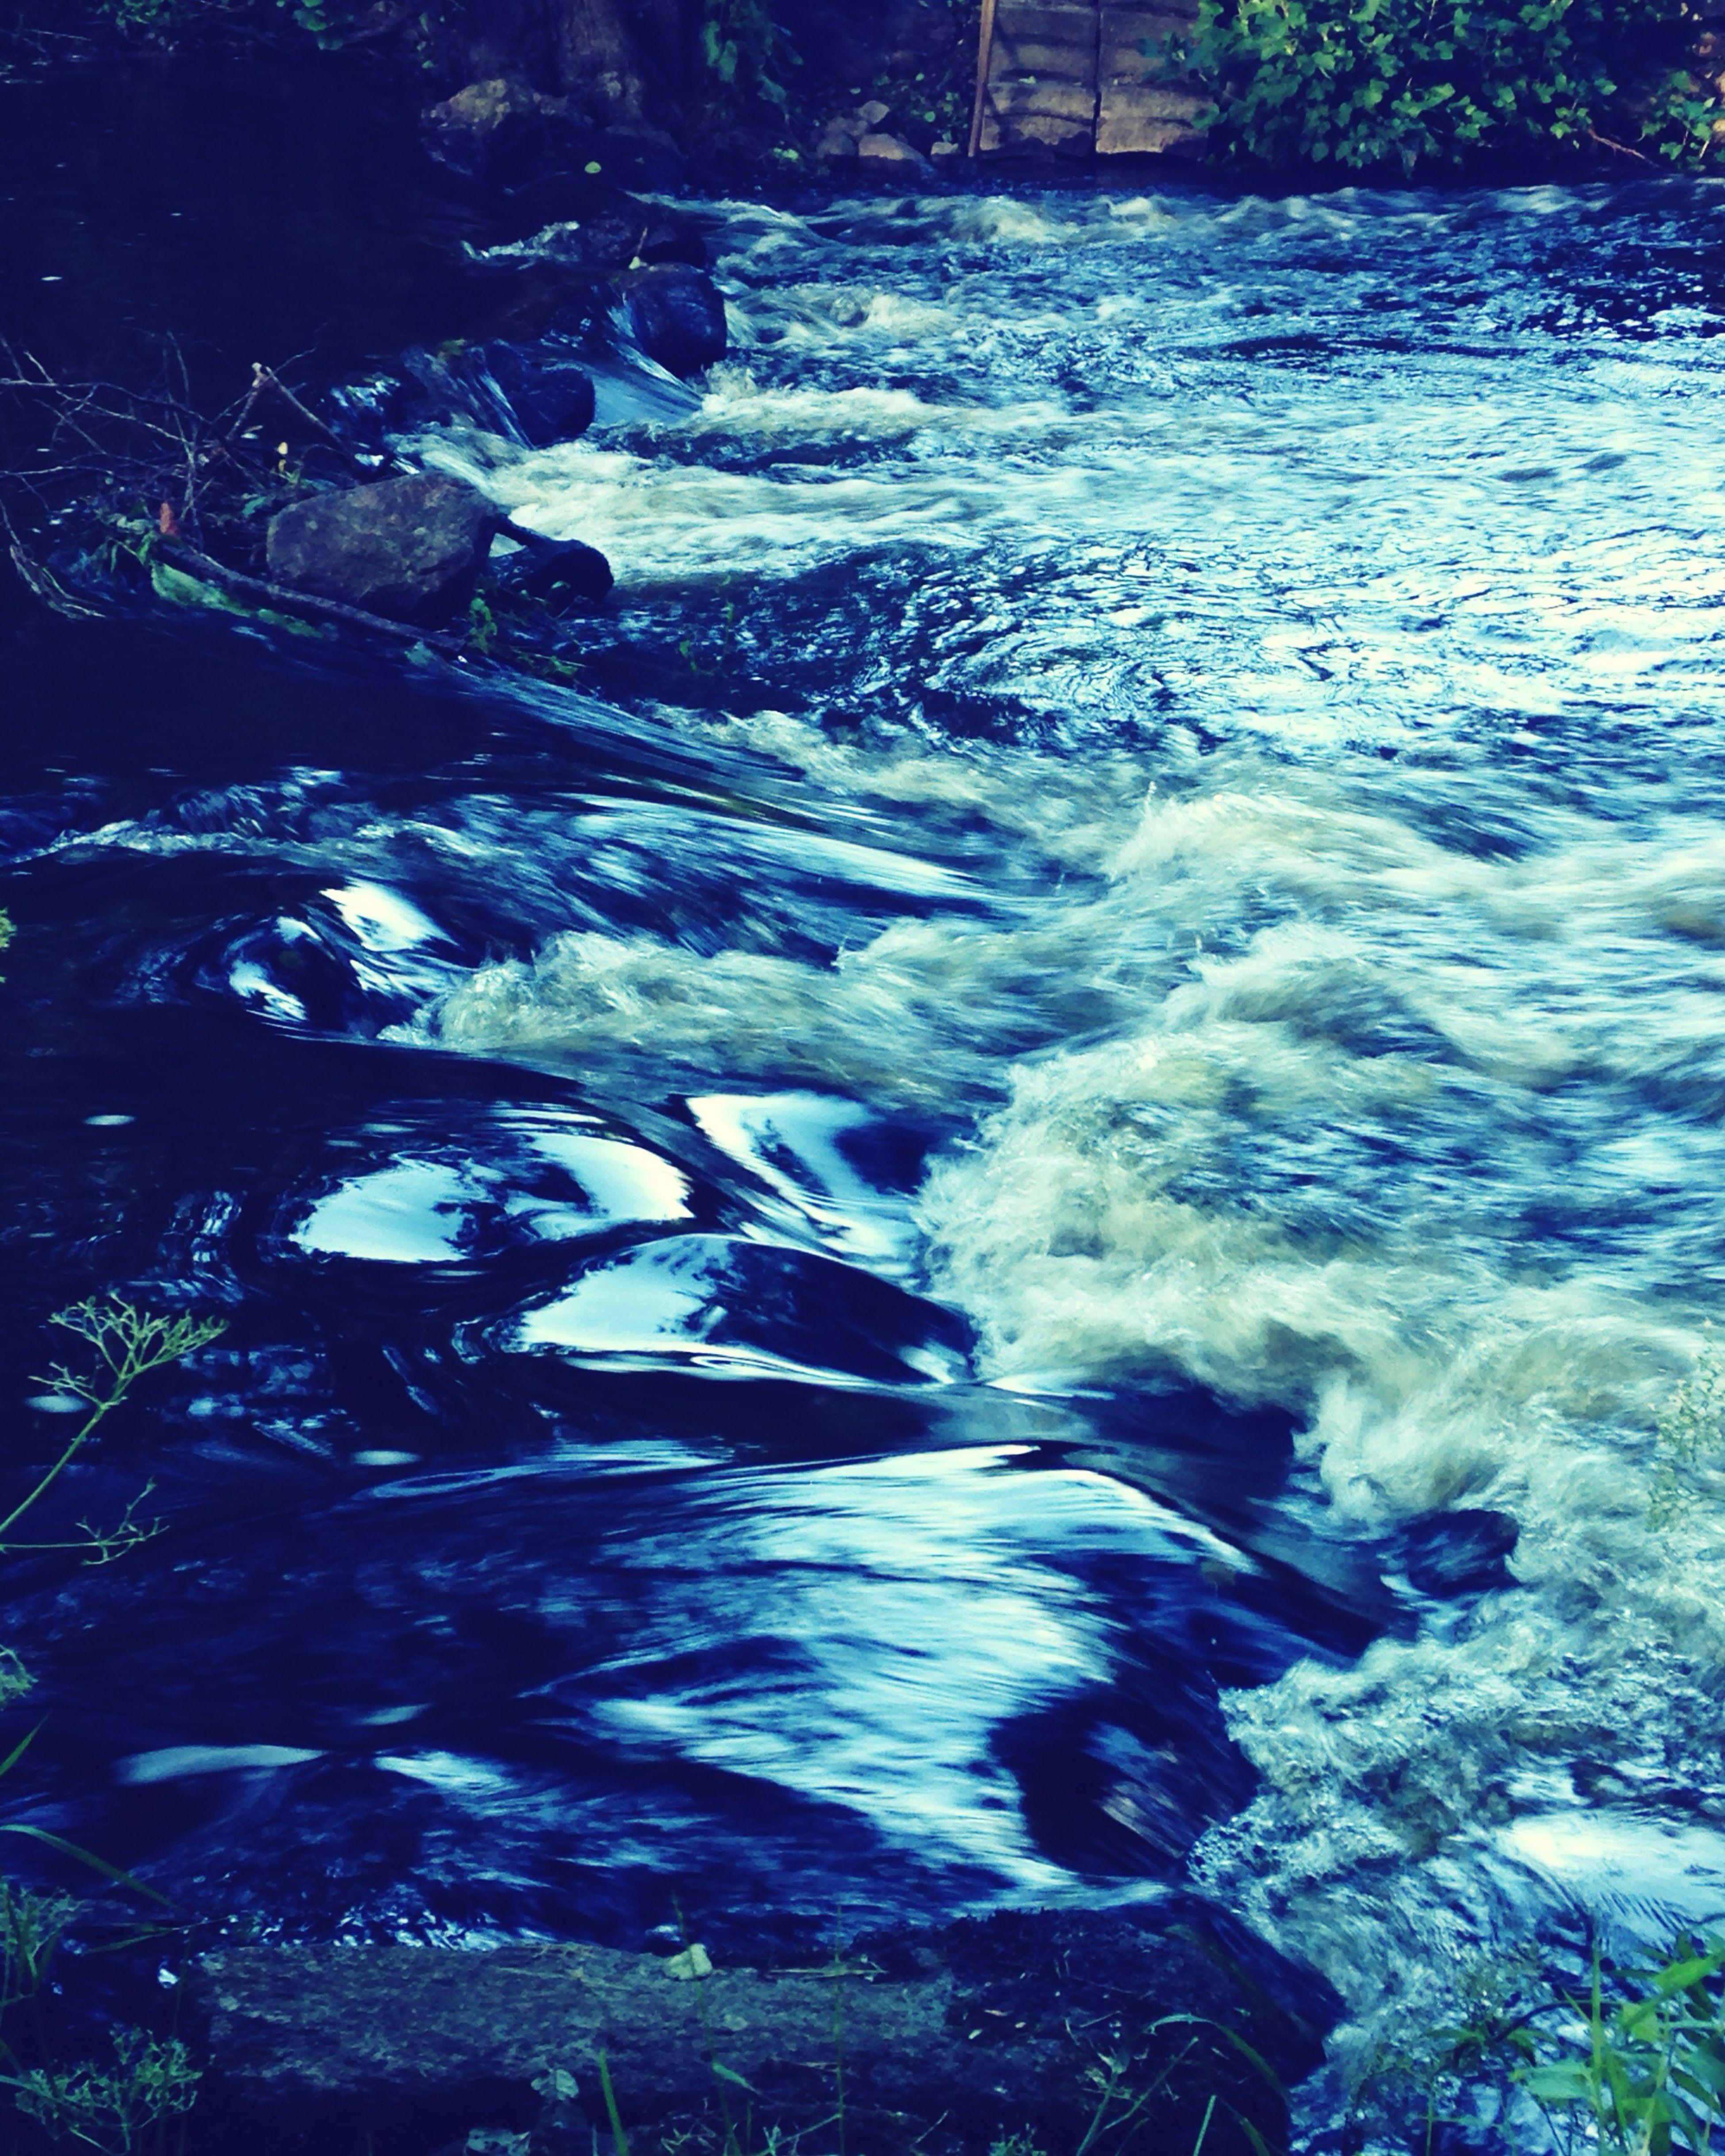 River View Beautiful Nature